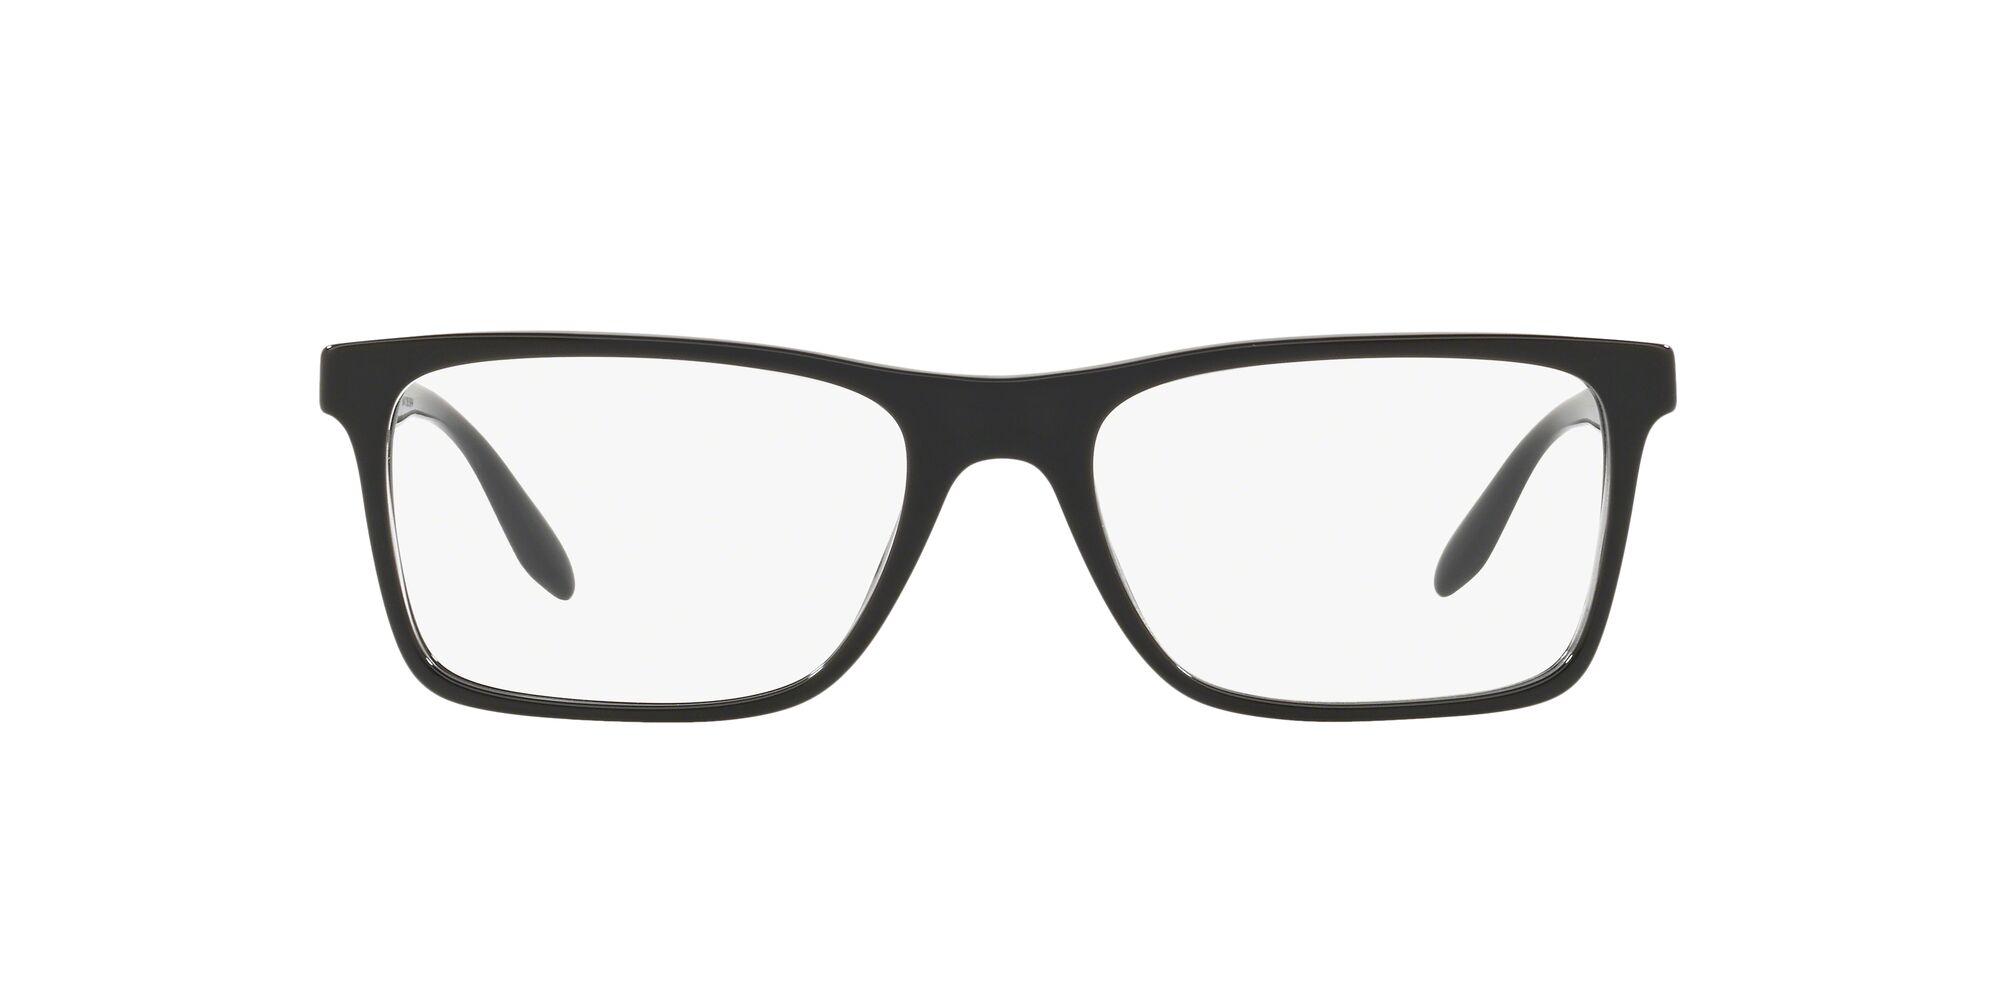 occhiali da vista 2020